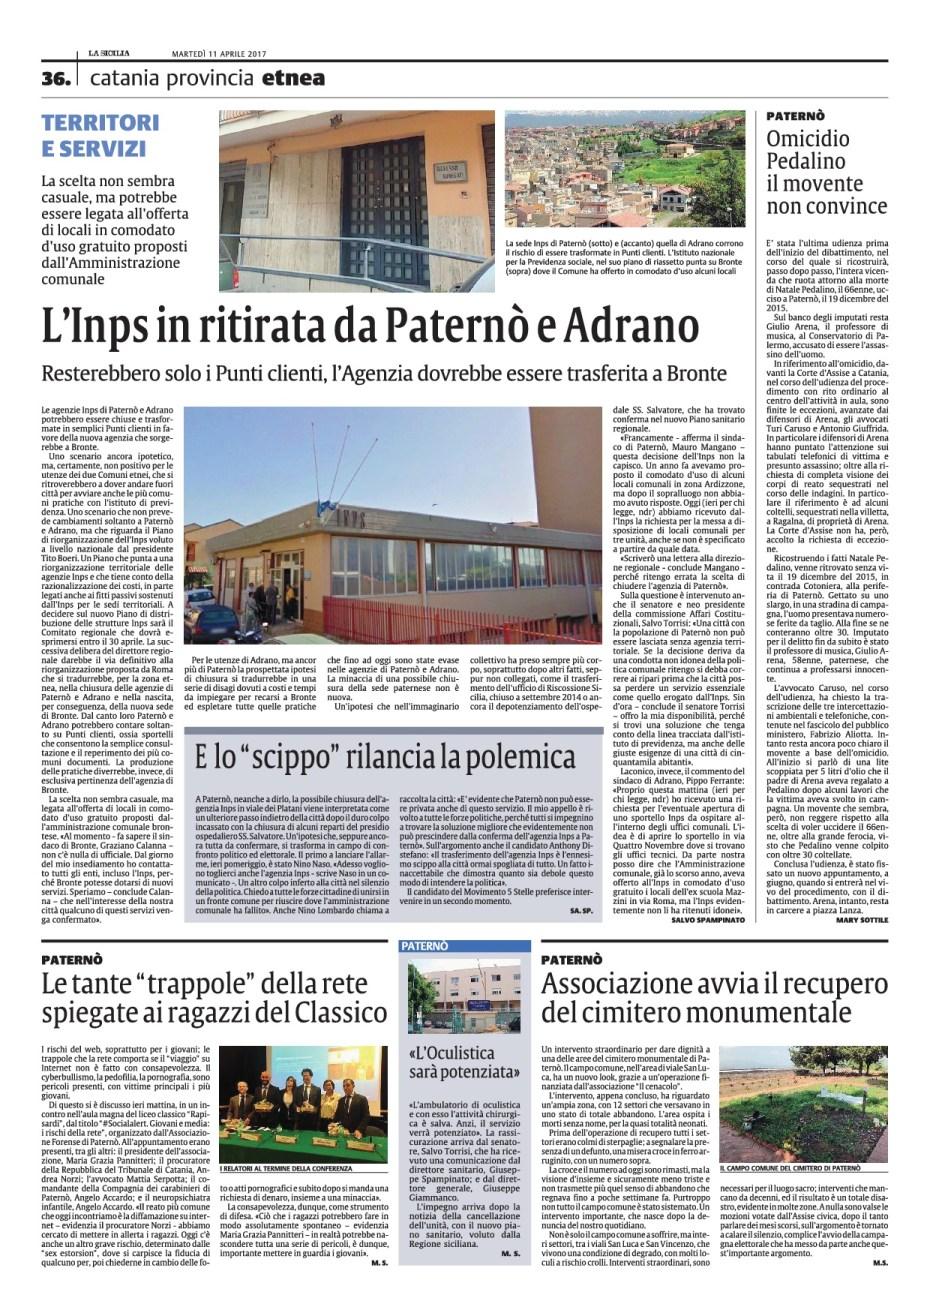 La Sicilia 11 Aprile 2017